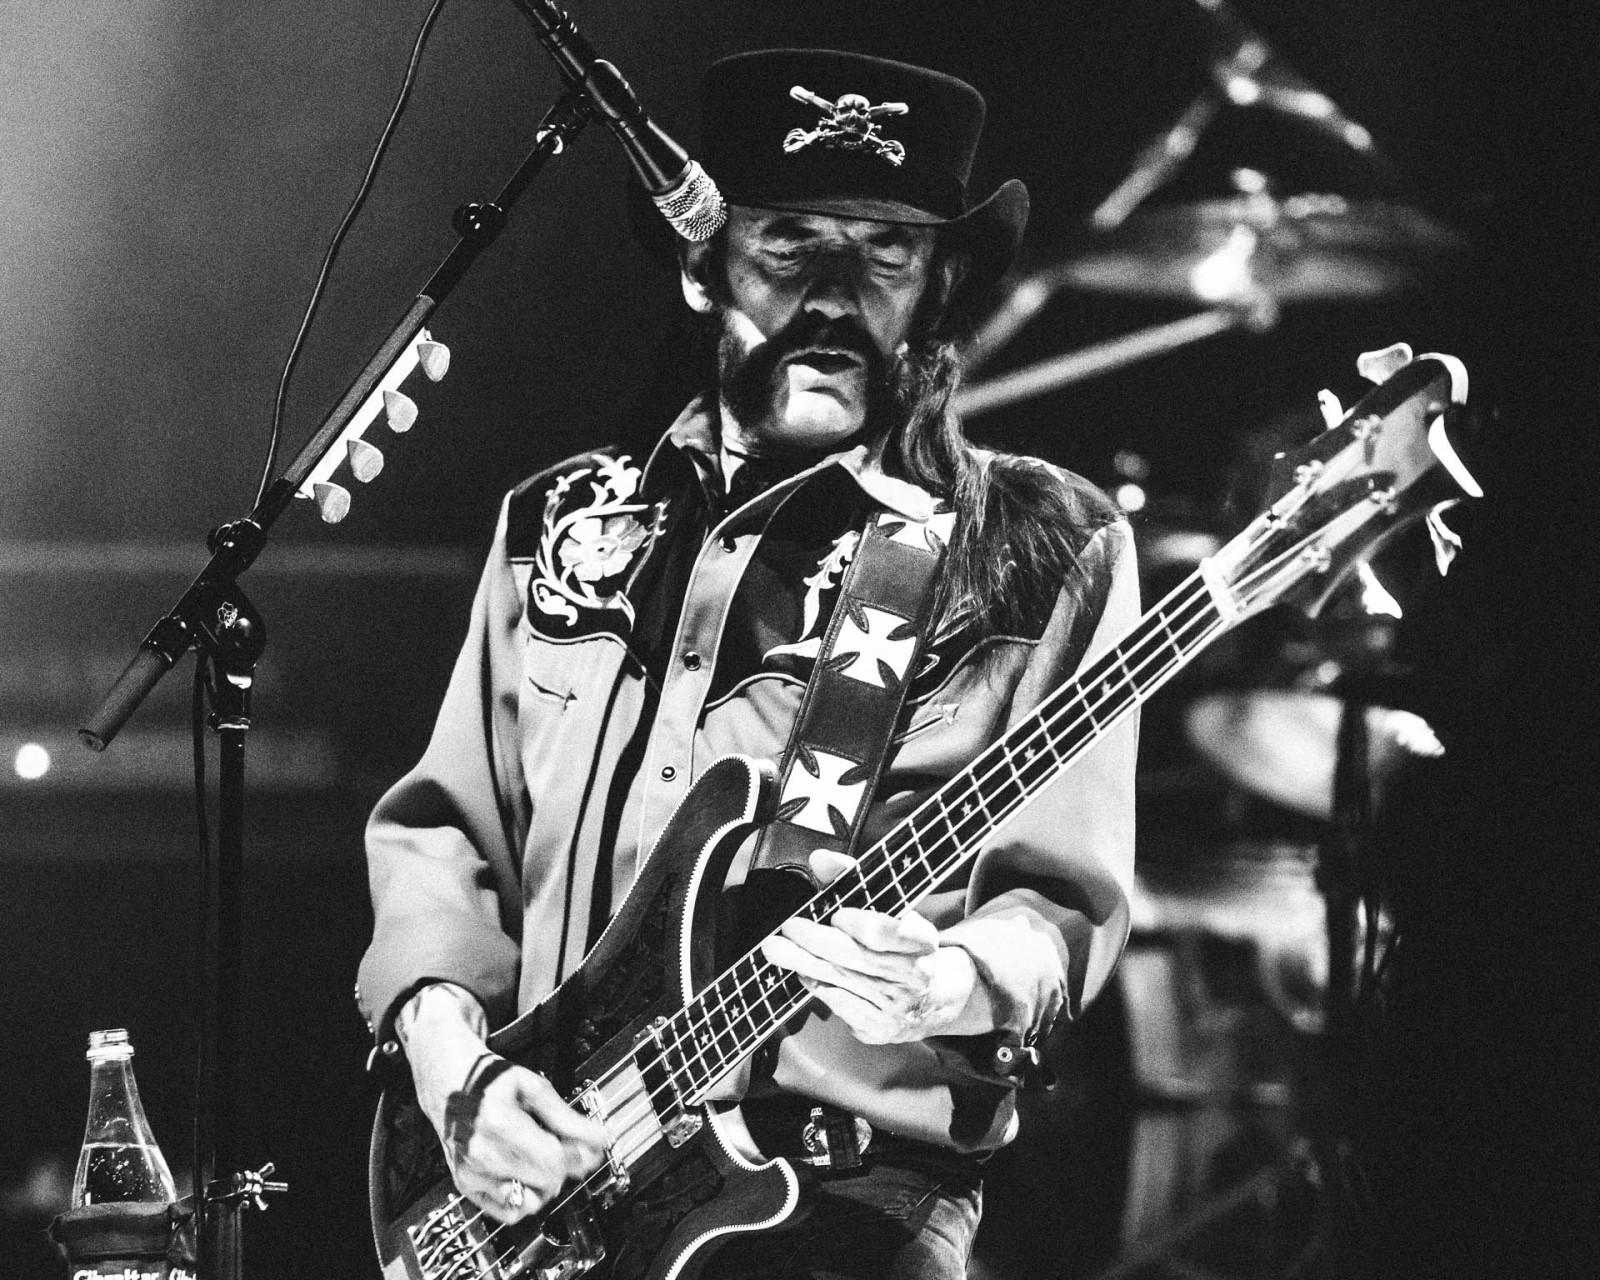 Motörhead photo by Sean Molin